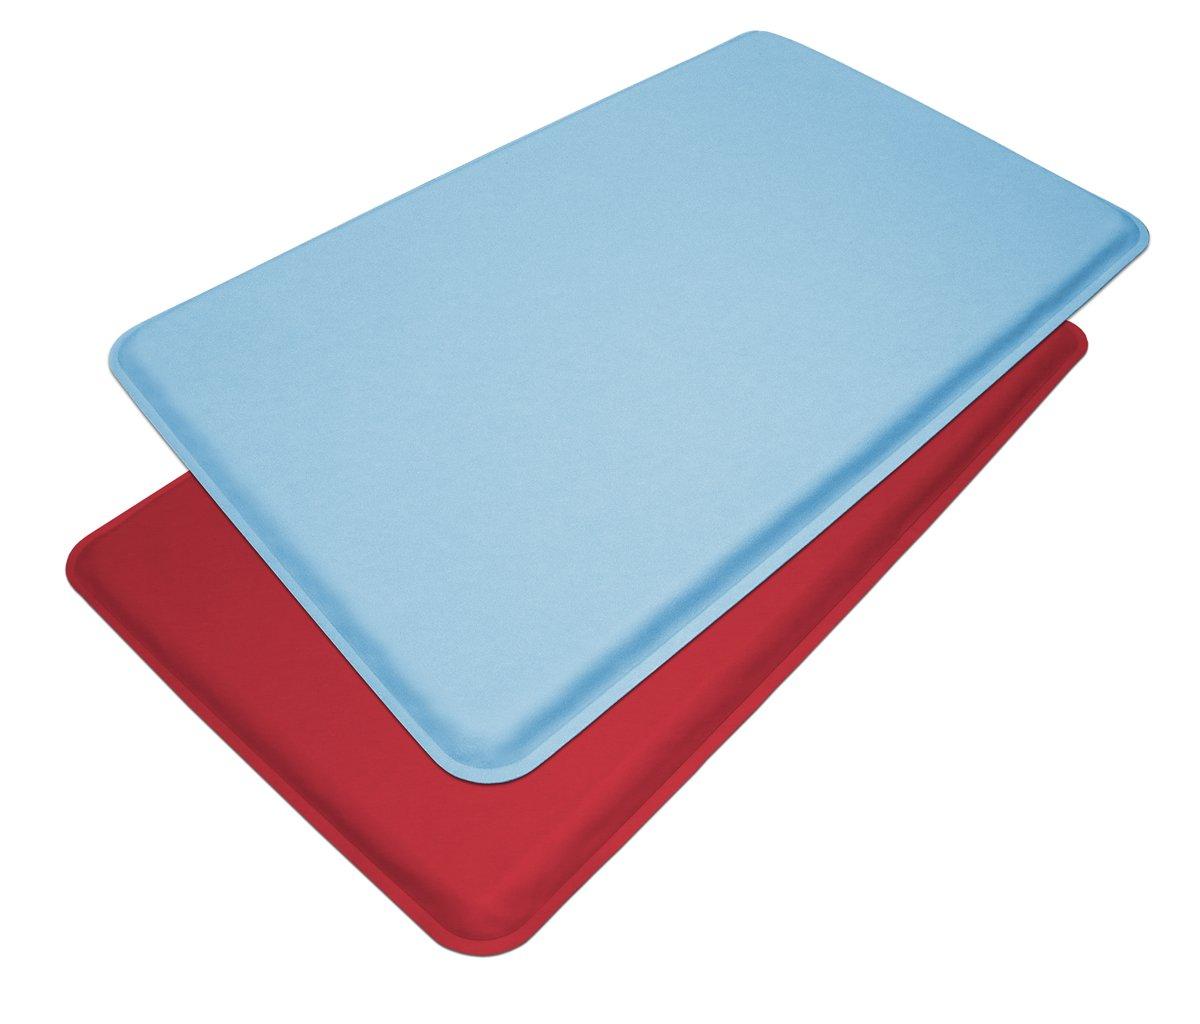 "GelPro Medical Anti-Fatigue Mat: Standing Anti-Fatigue Floor Mat - Non Slip Heavy Duty Professional Mats - Ergonomic Cushioned Comfort Pad - 20"" x 48"" - Columbia Blue by GelPro (Image #5)"